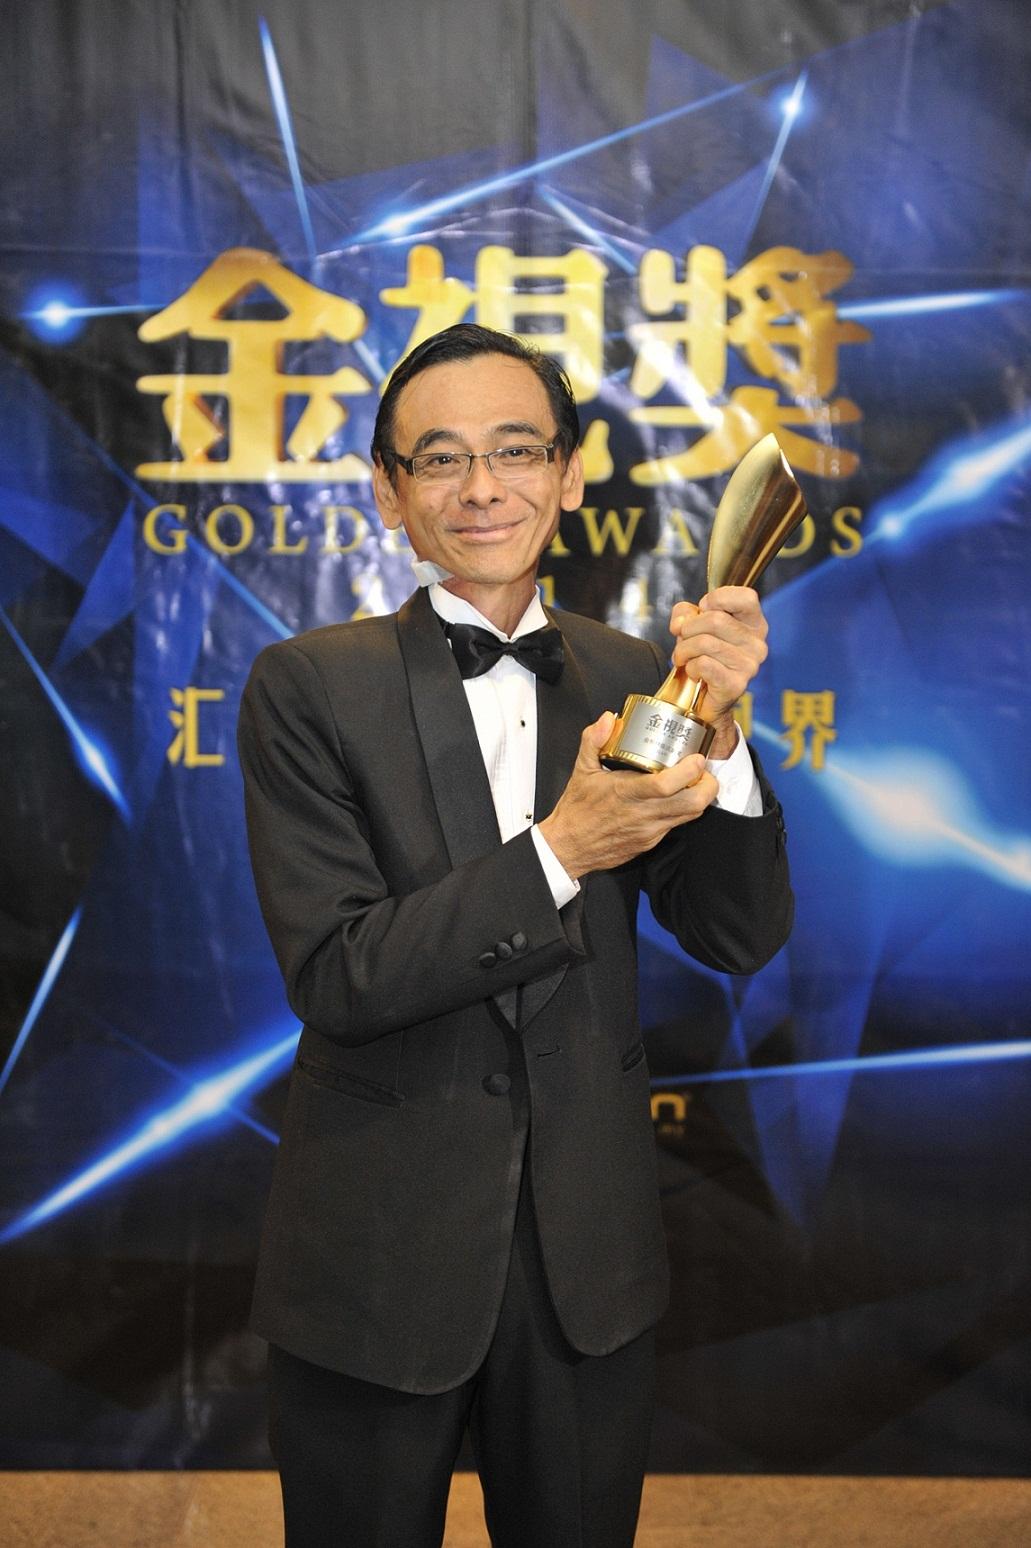 Lifettime Achievement Award - Phua Chee Kian